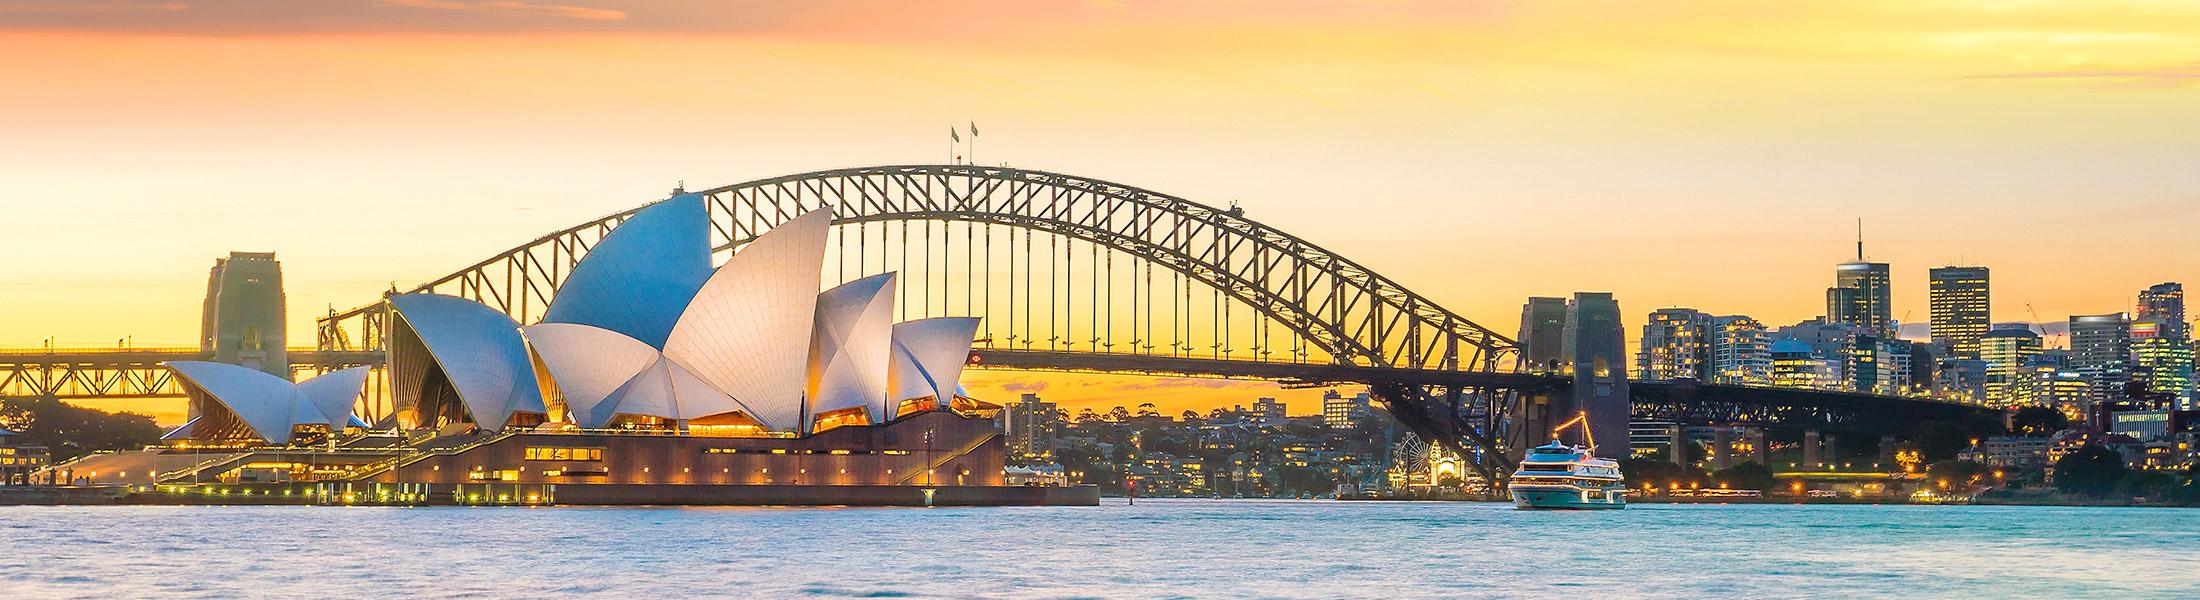 Sunset at Sydney Harbour Bridge and Sydney Opera House in Australia